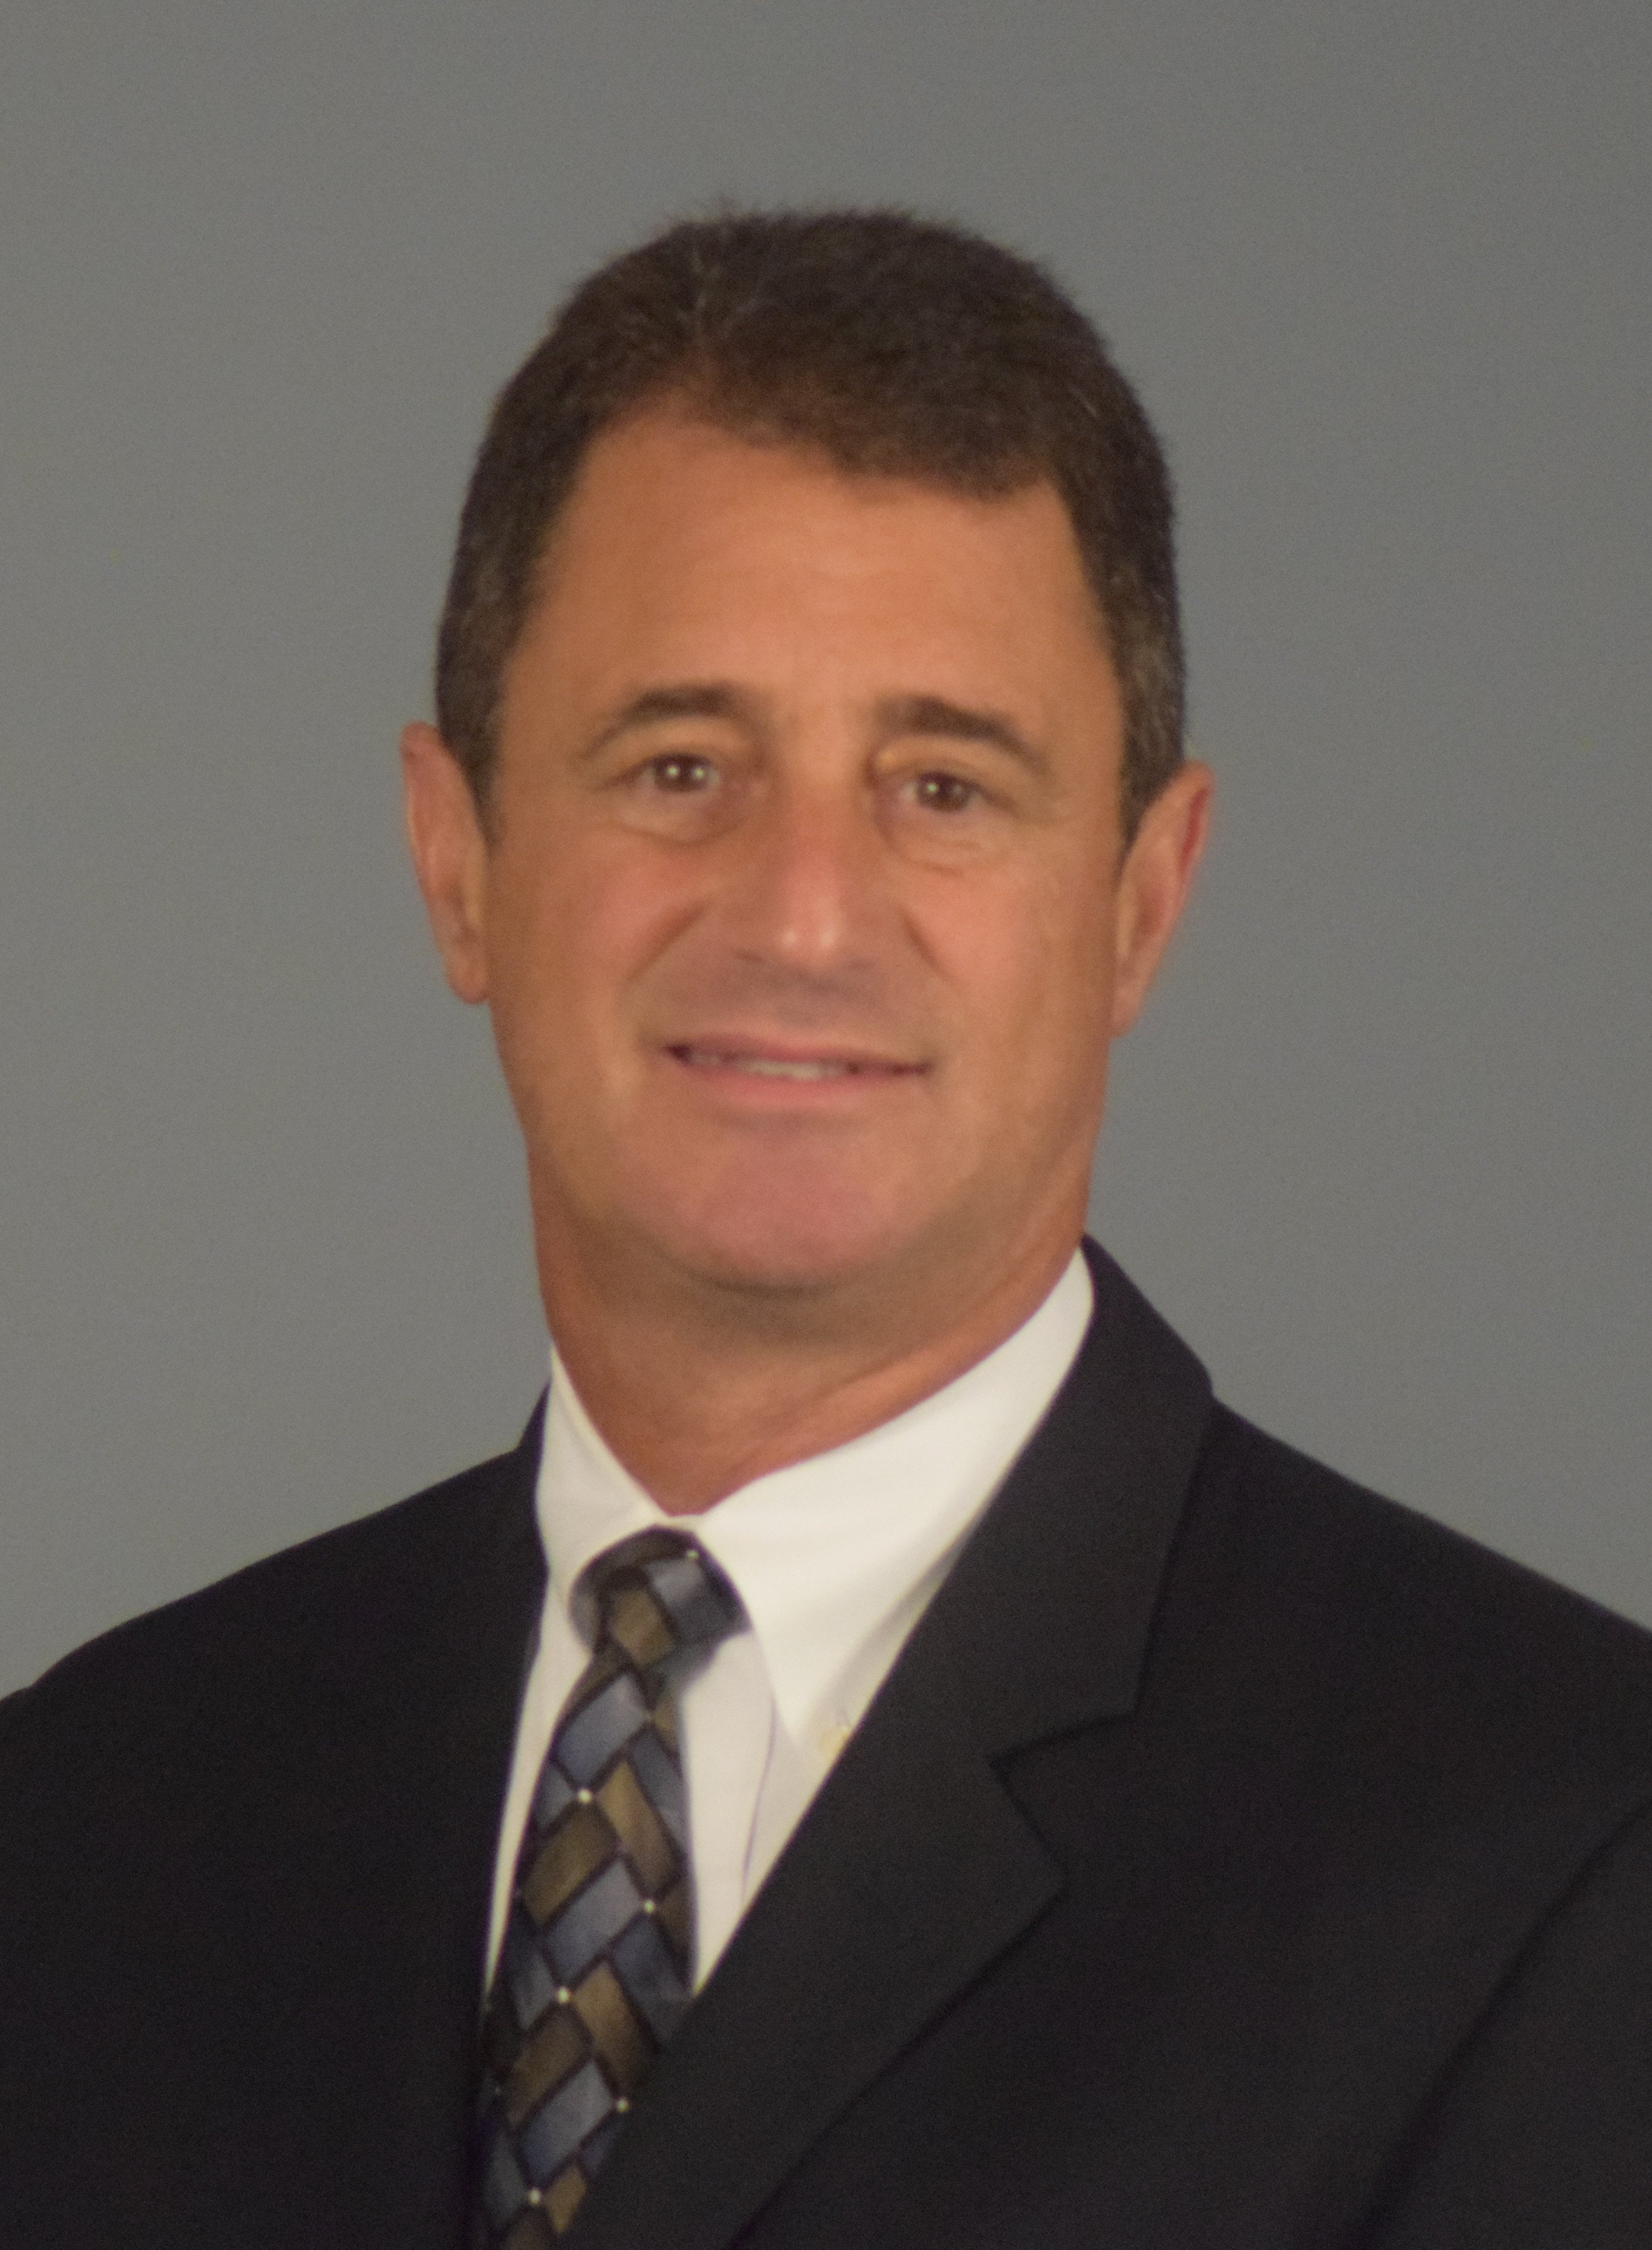 Orthopedic Surgeon Boca Raton Dr. Luskin. Orthopedic hand surgeon boca raton and boynton beach